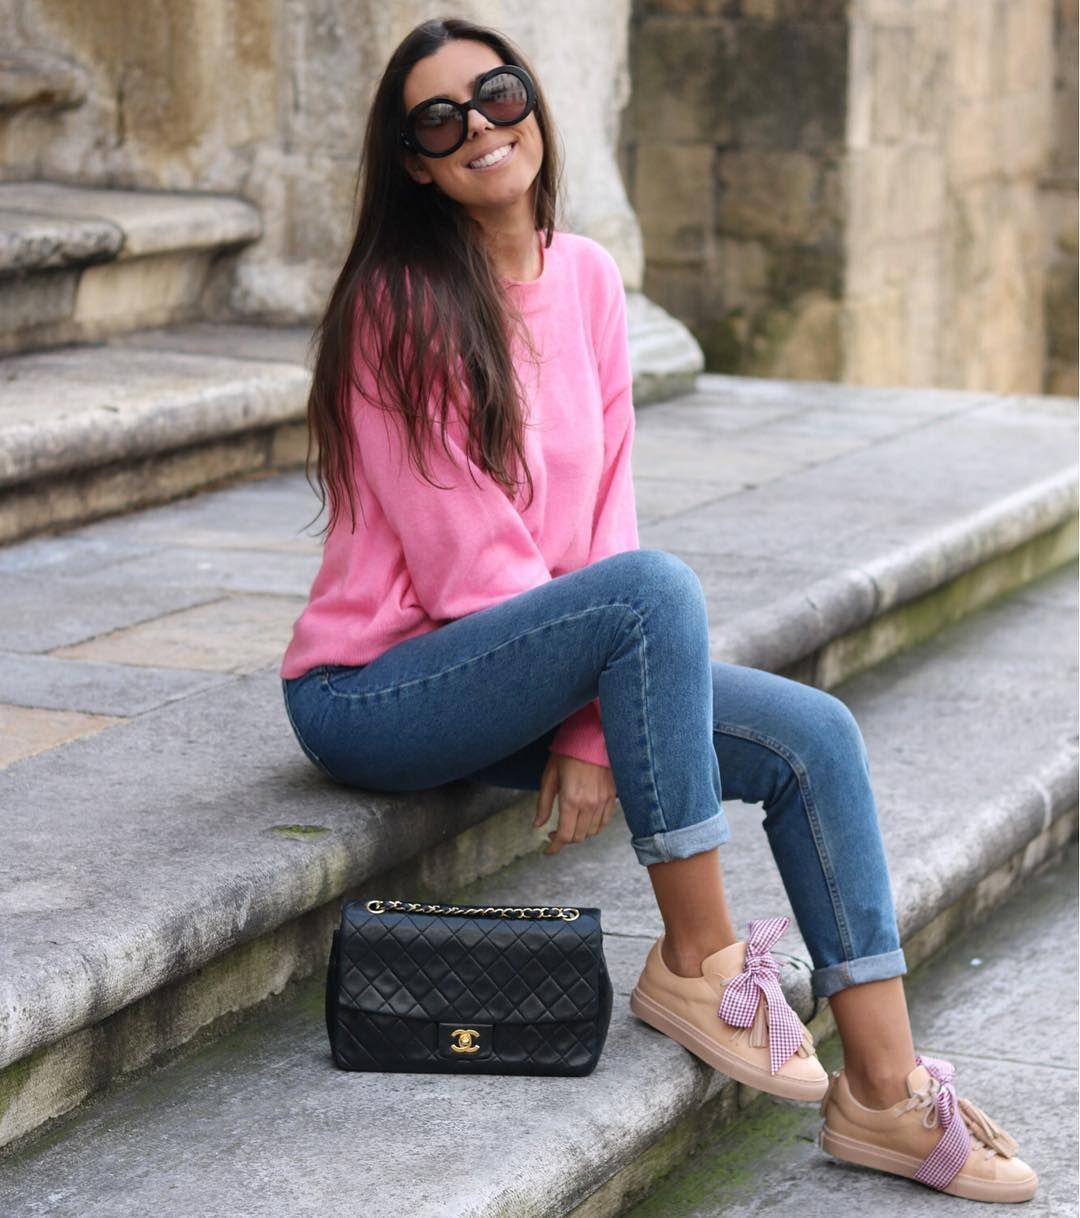 Carolina (@thefrenchfries) wears Benetton TV31100 sweater ❤